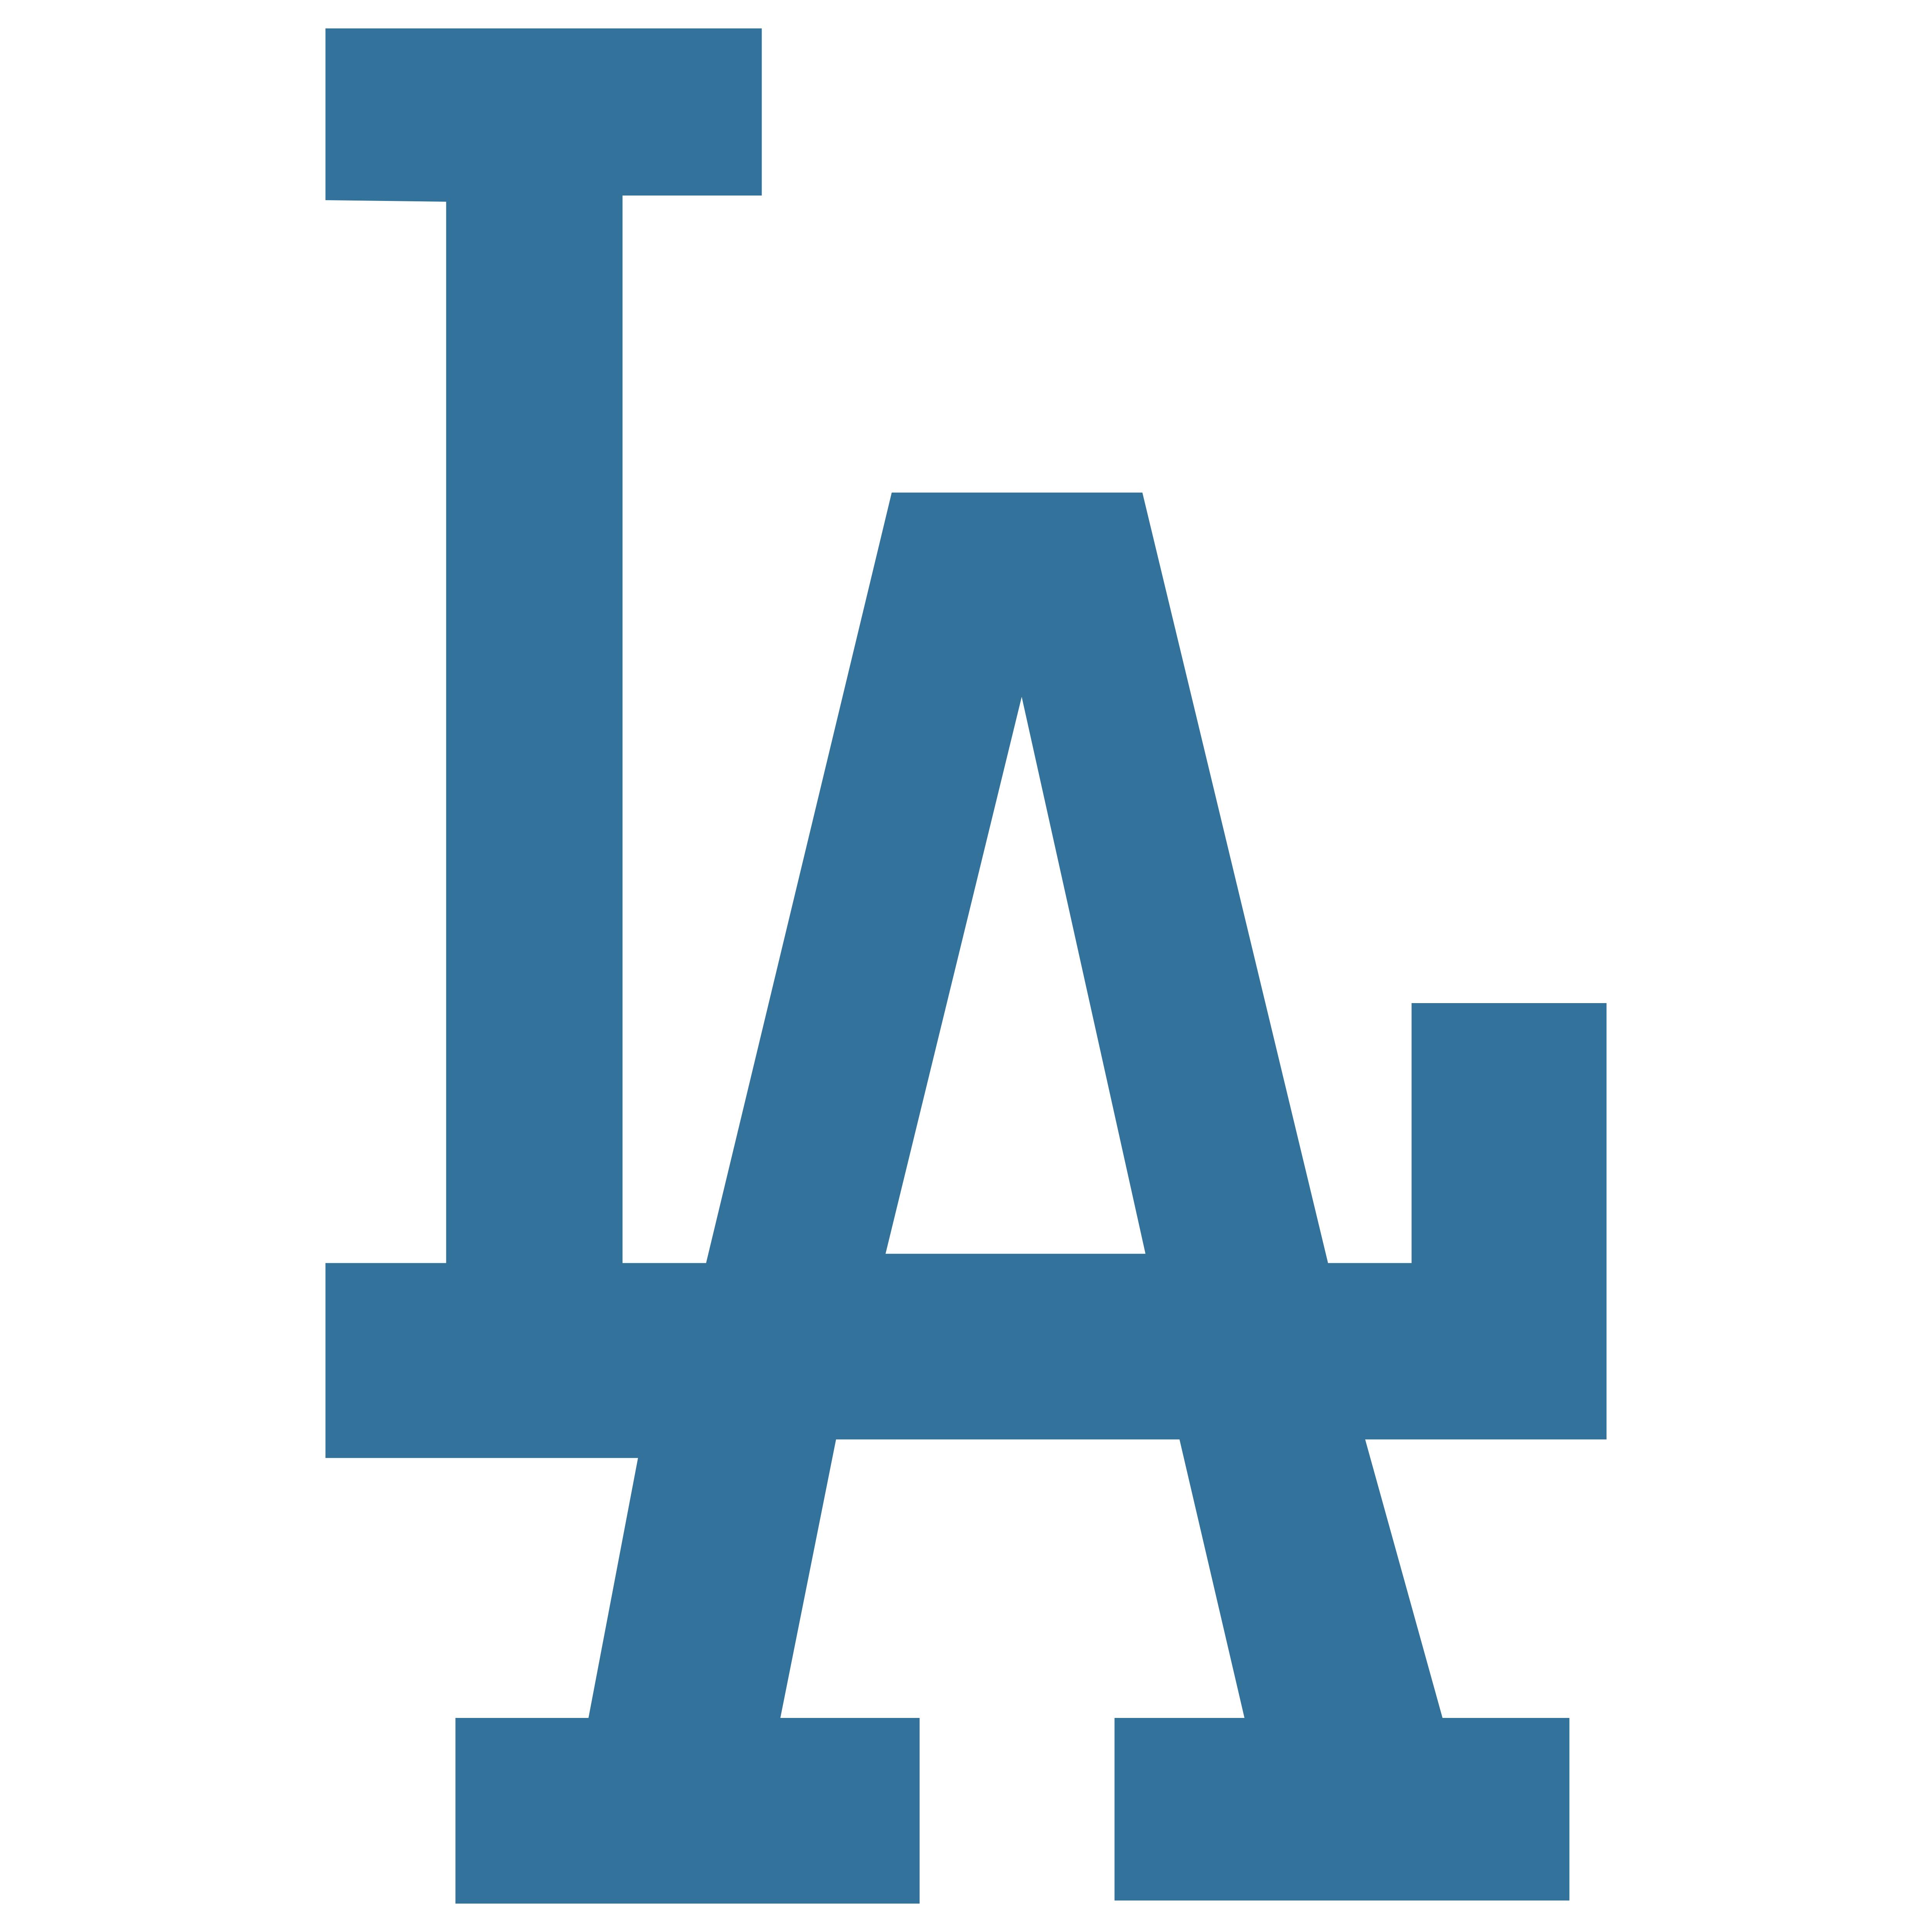 Los Angeles Dodgers – Logos Download